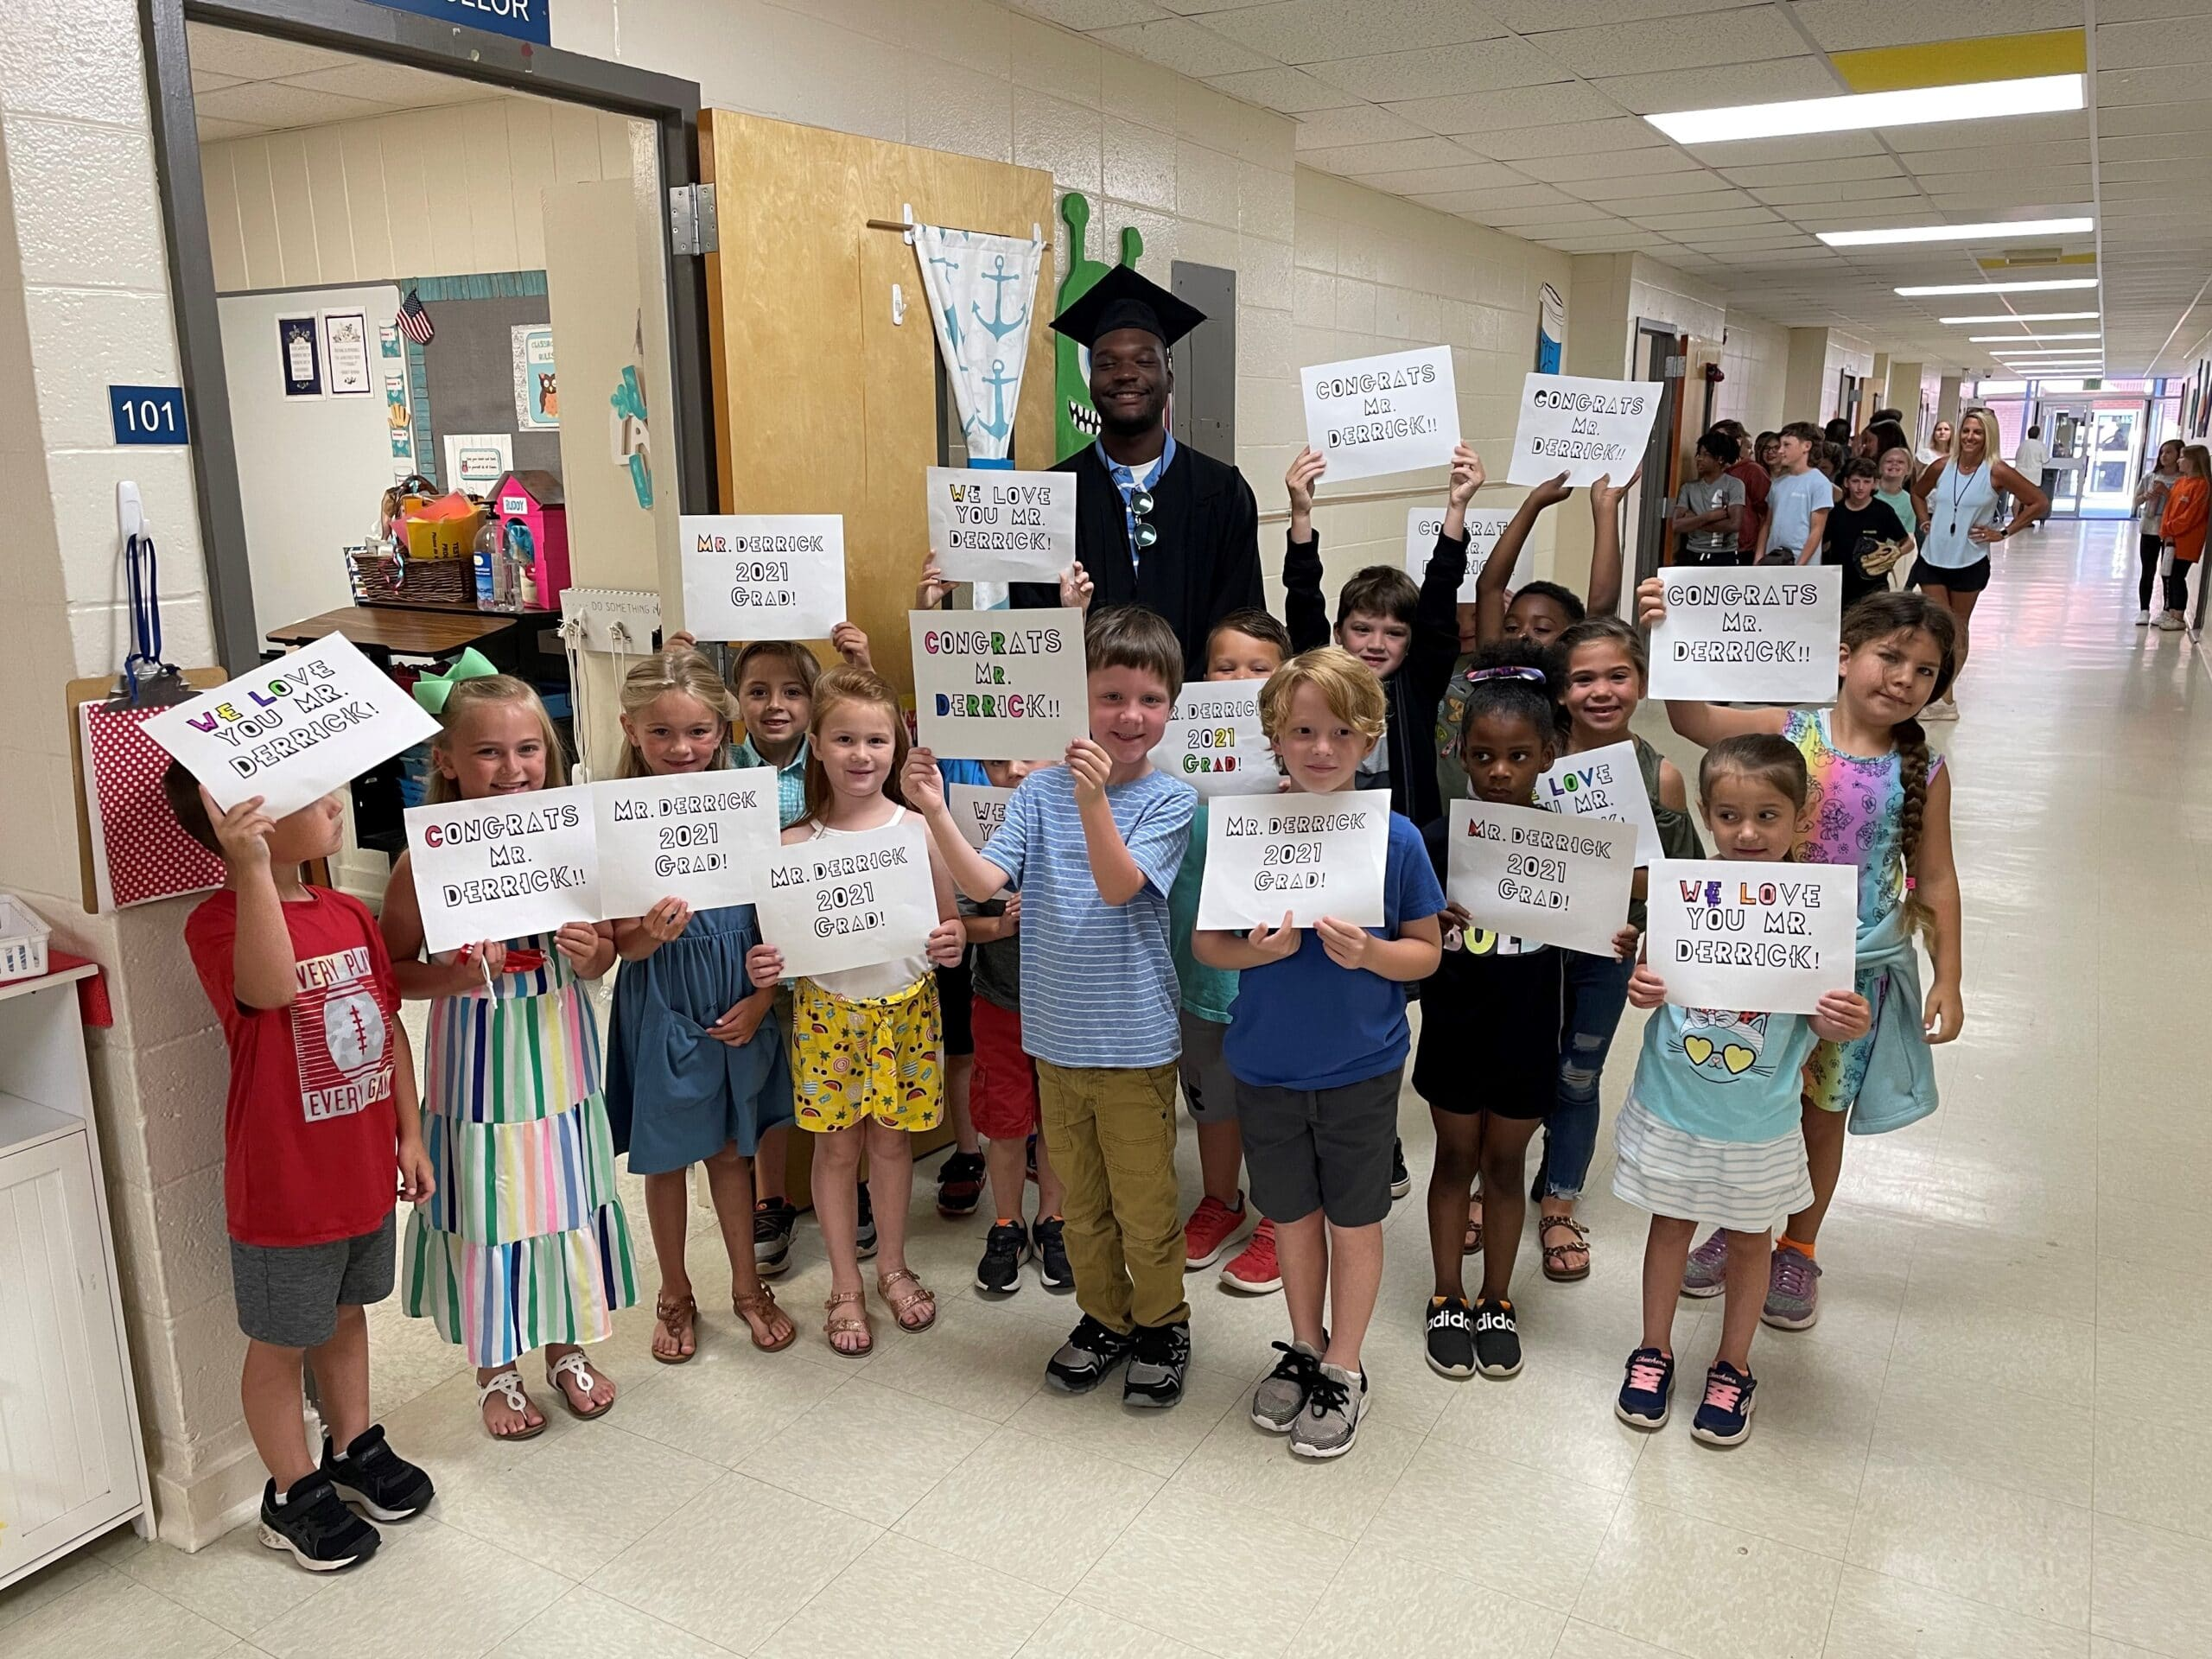 Beloved school custodian Derrick Harris begins new chapter at AUM